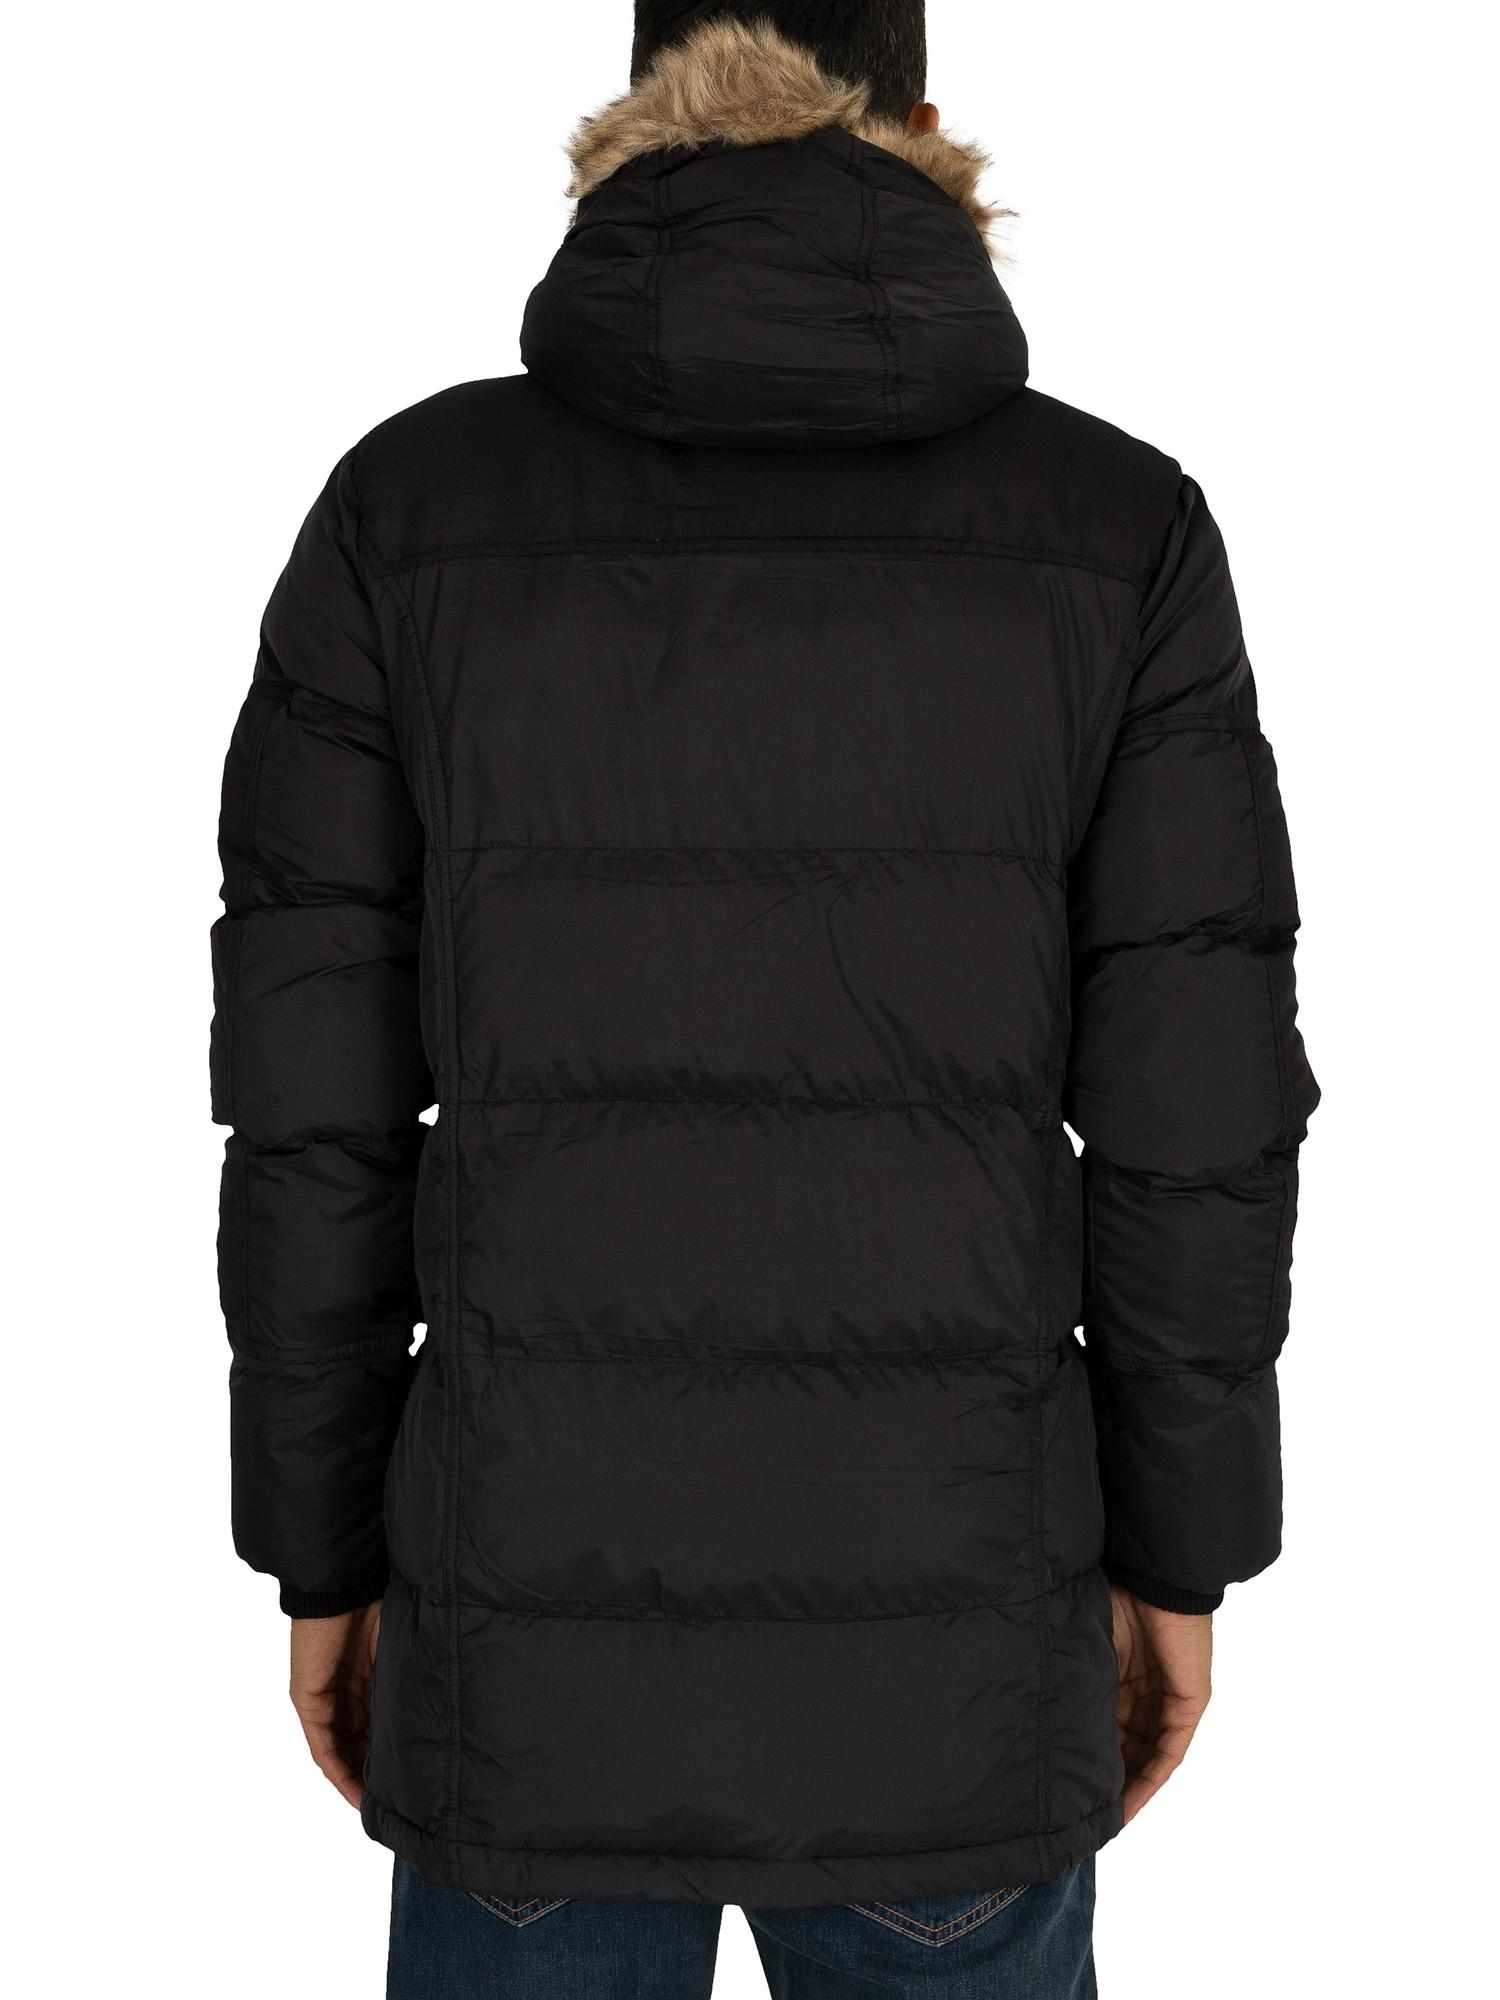 4Bidden Men/'s Tornado Fur Parka Jacket Black